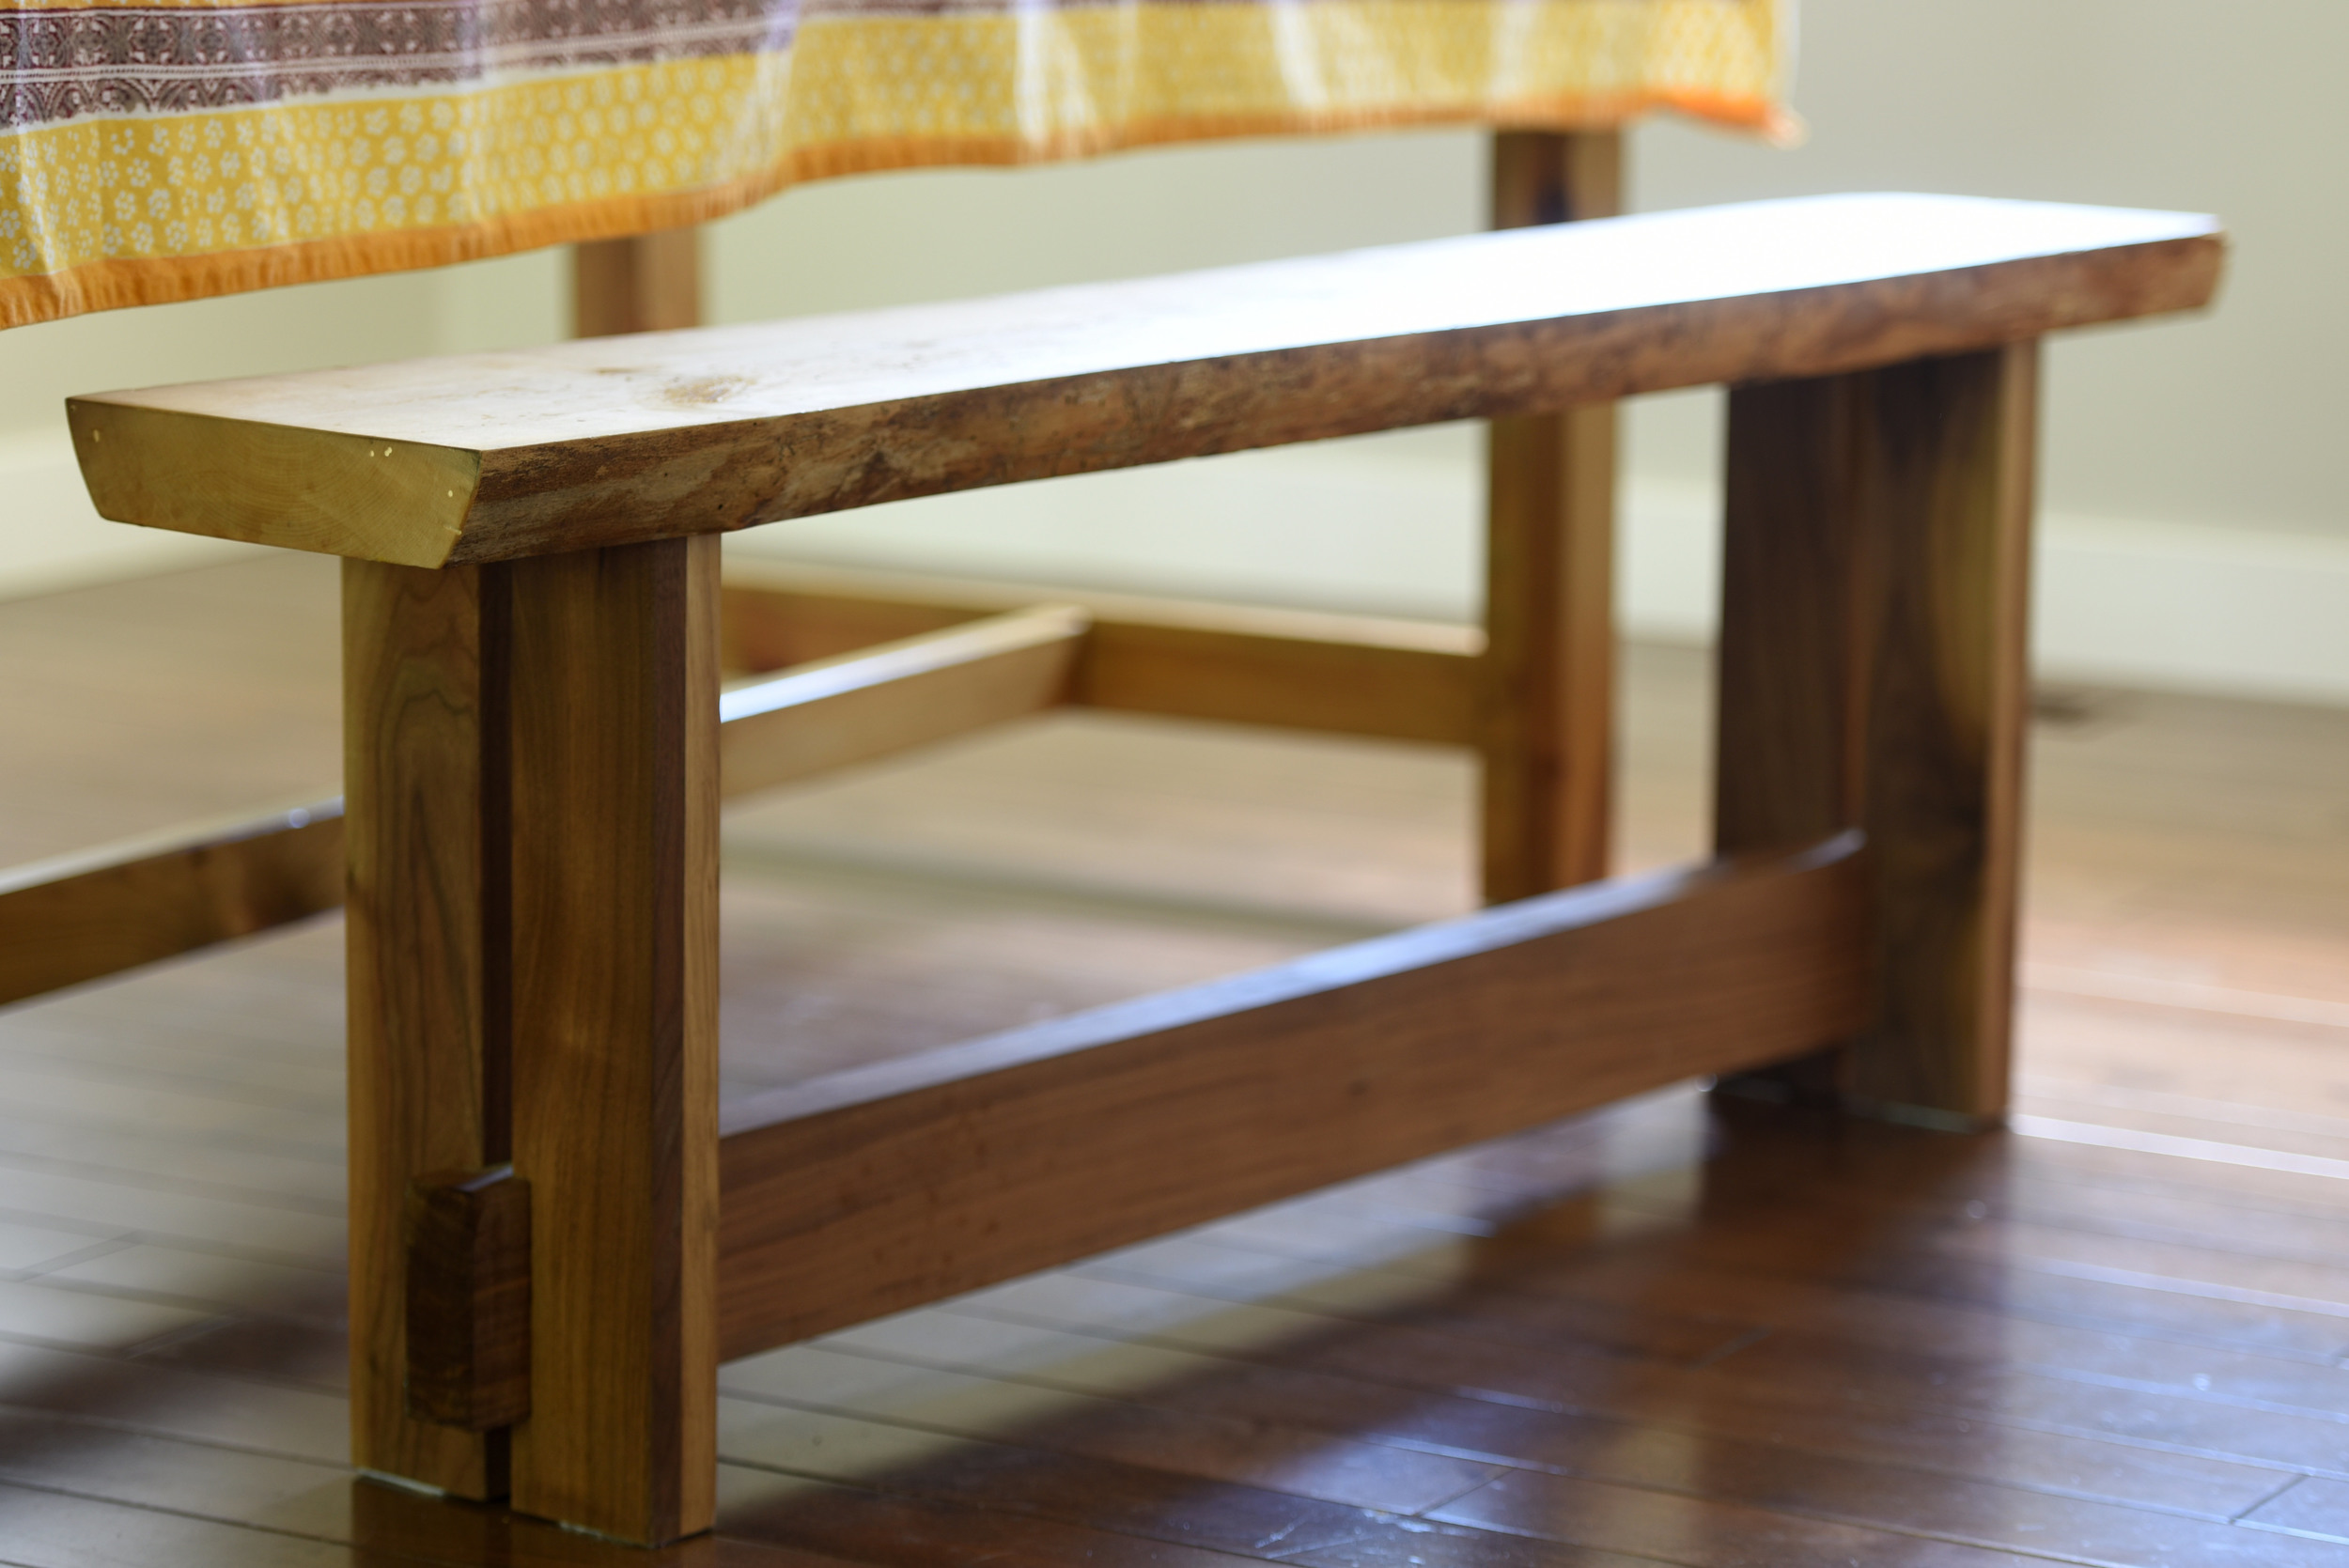 mortise-and-tenon-custom-live-edge-bench.jpg